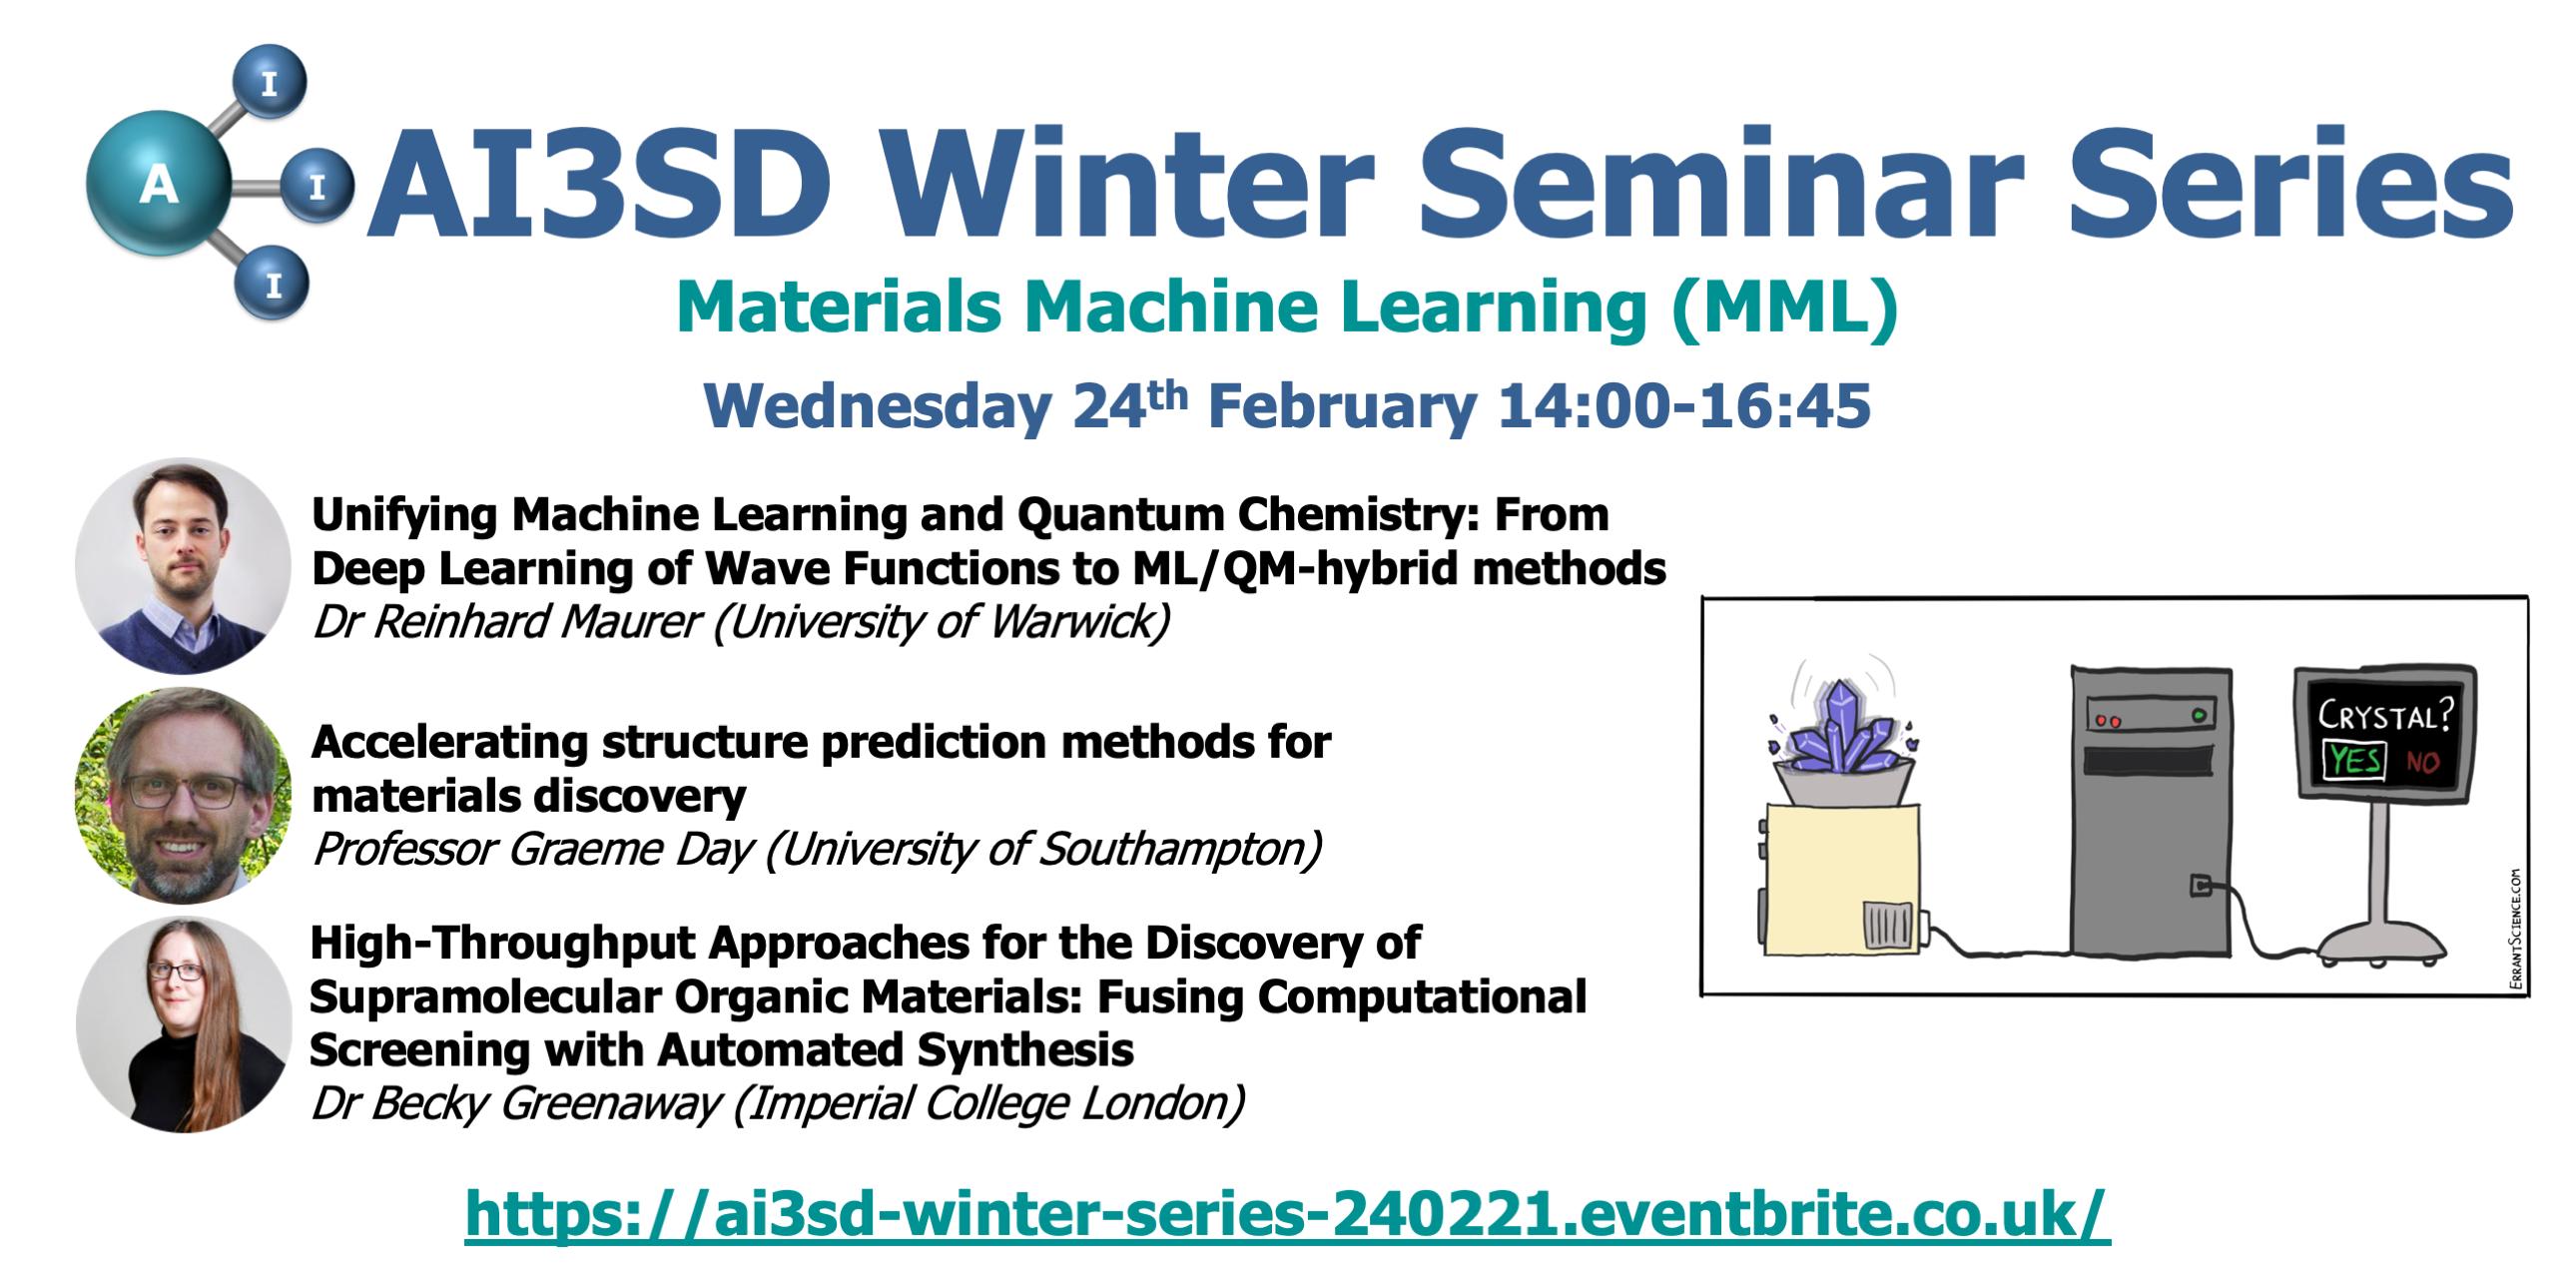 24/02/2021 – AI3SD Winter Seminar Series: Materials Machine Learning (MML)